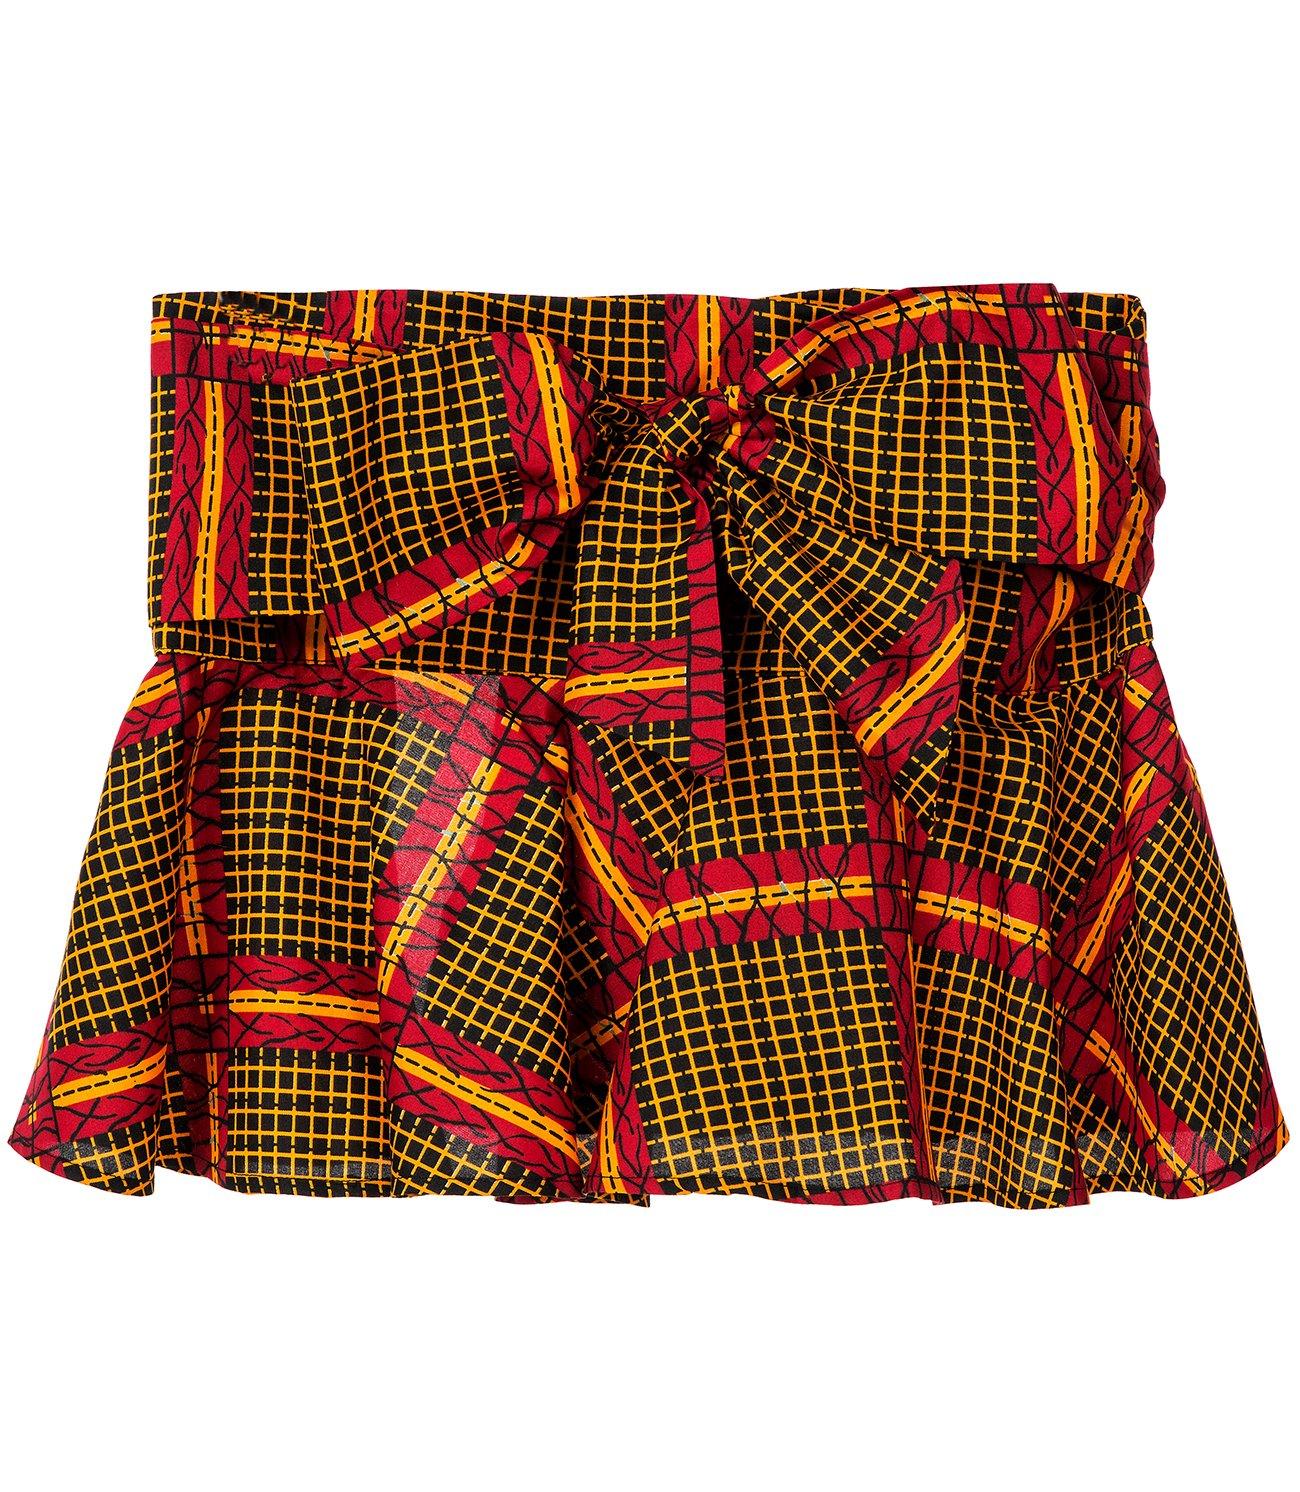 Shenbolen Women African Print Dashiki Tradition Waist Belts One Size (One Size, B)